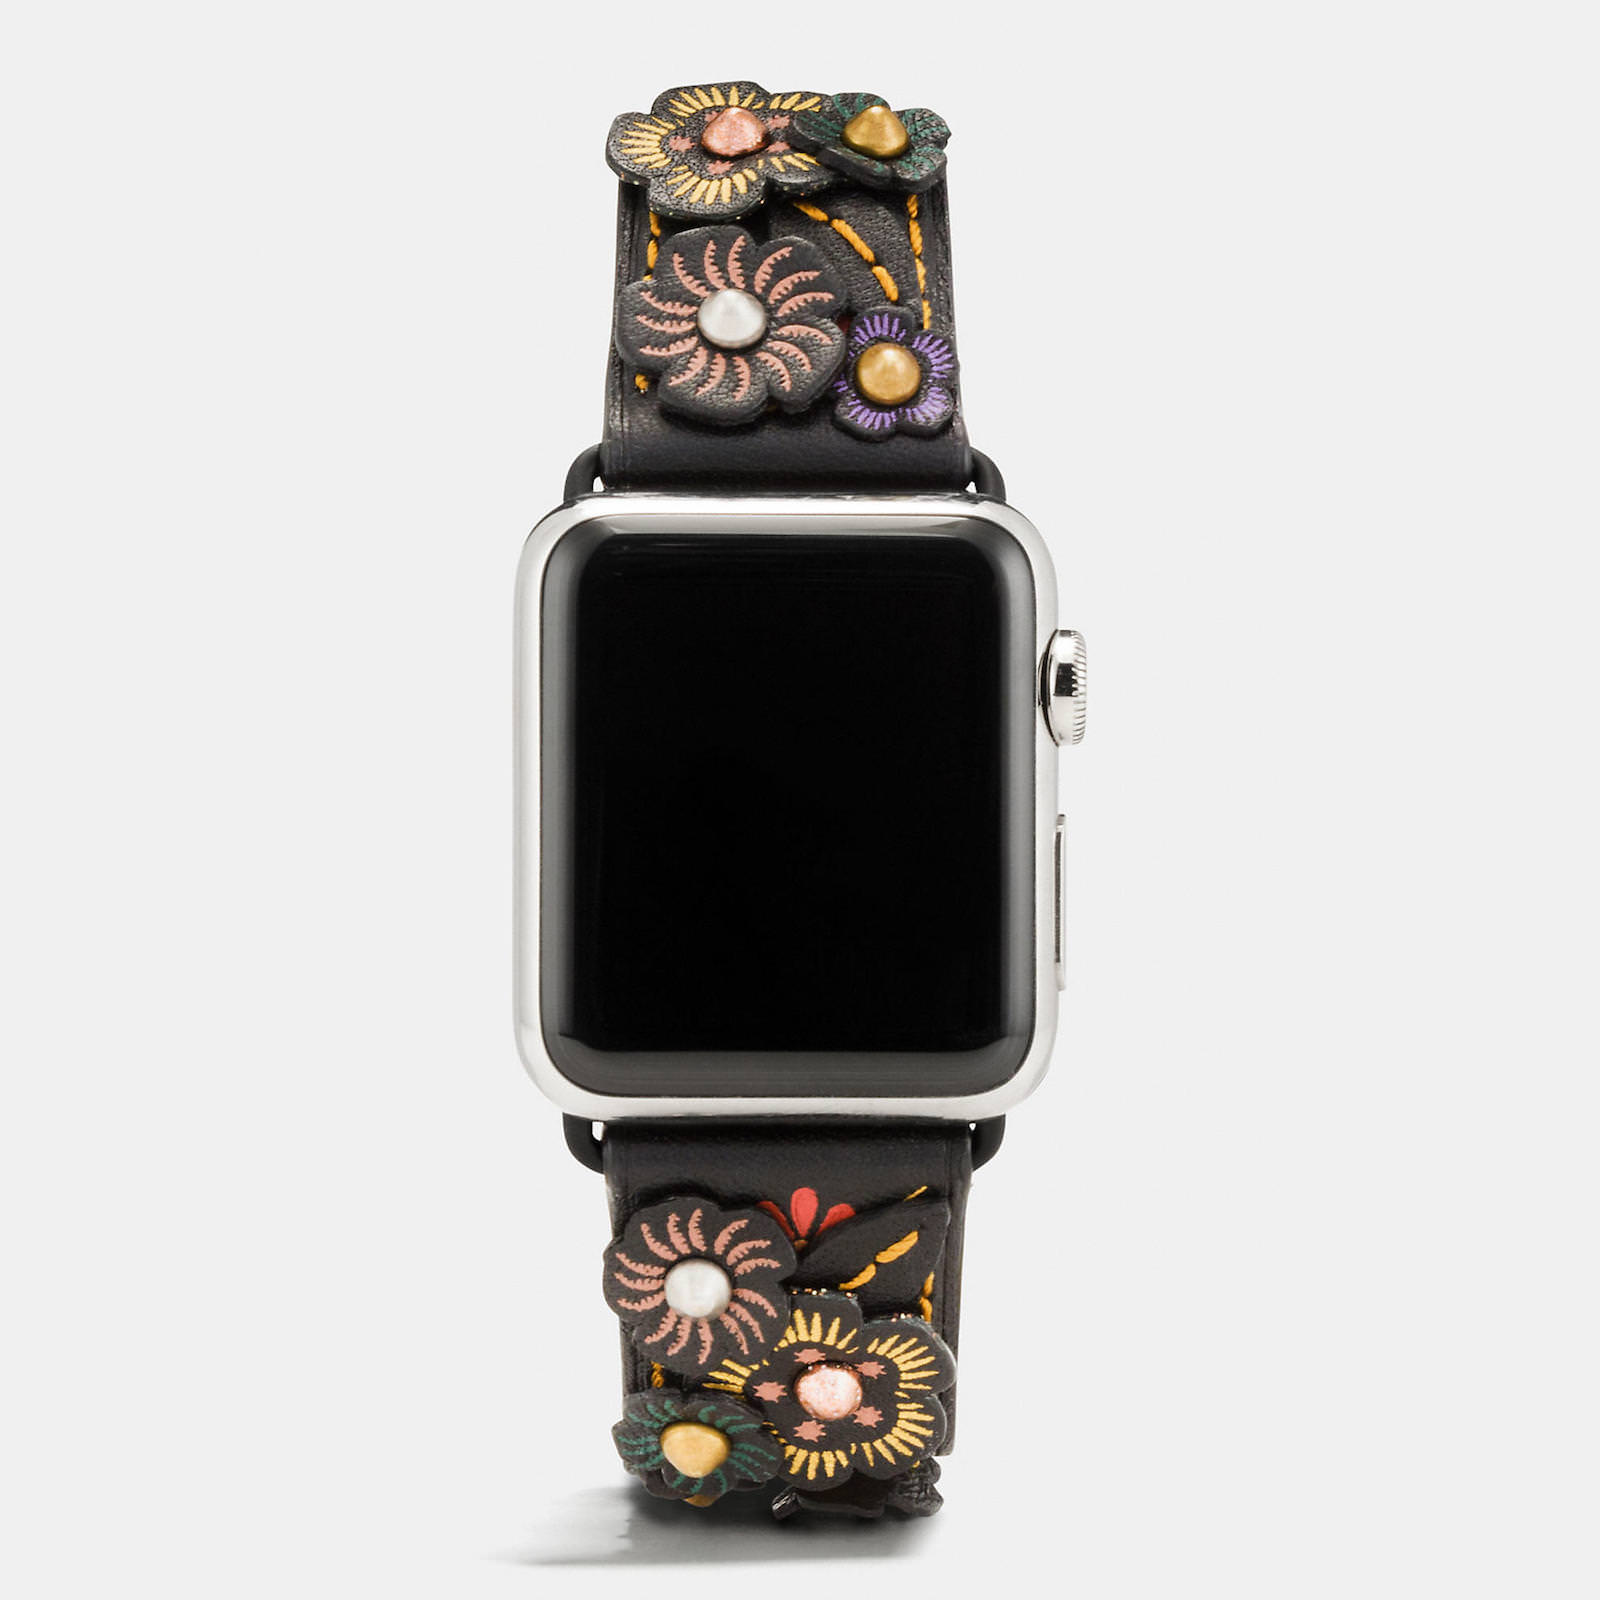 Apple-Watch-Coach-Band-Autumn-Season-2.jpeg